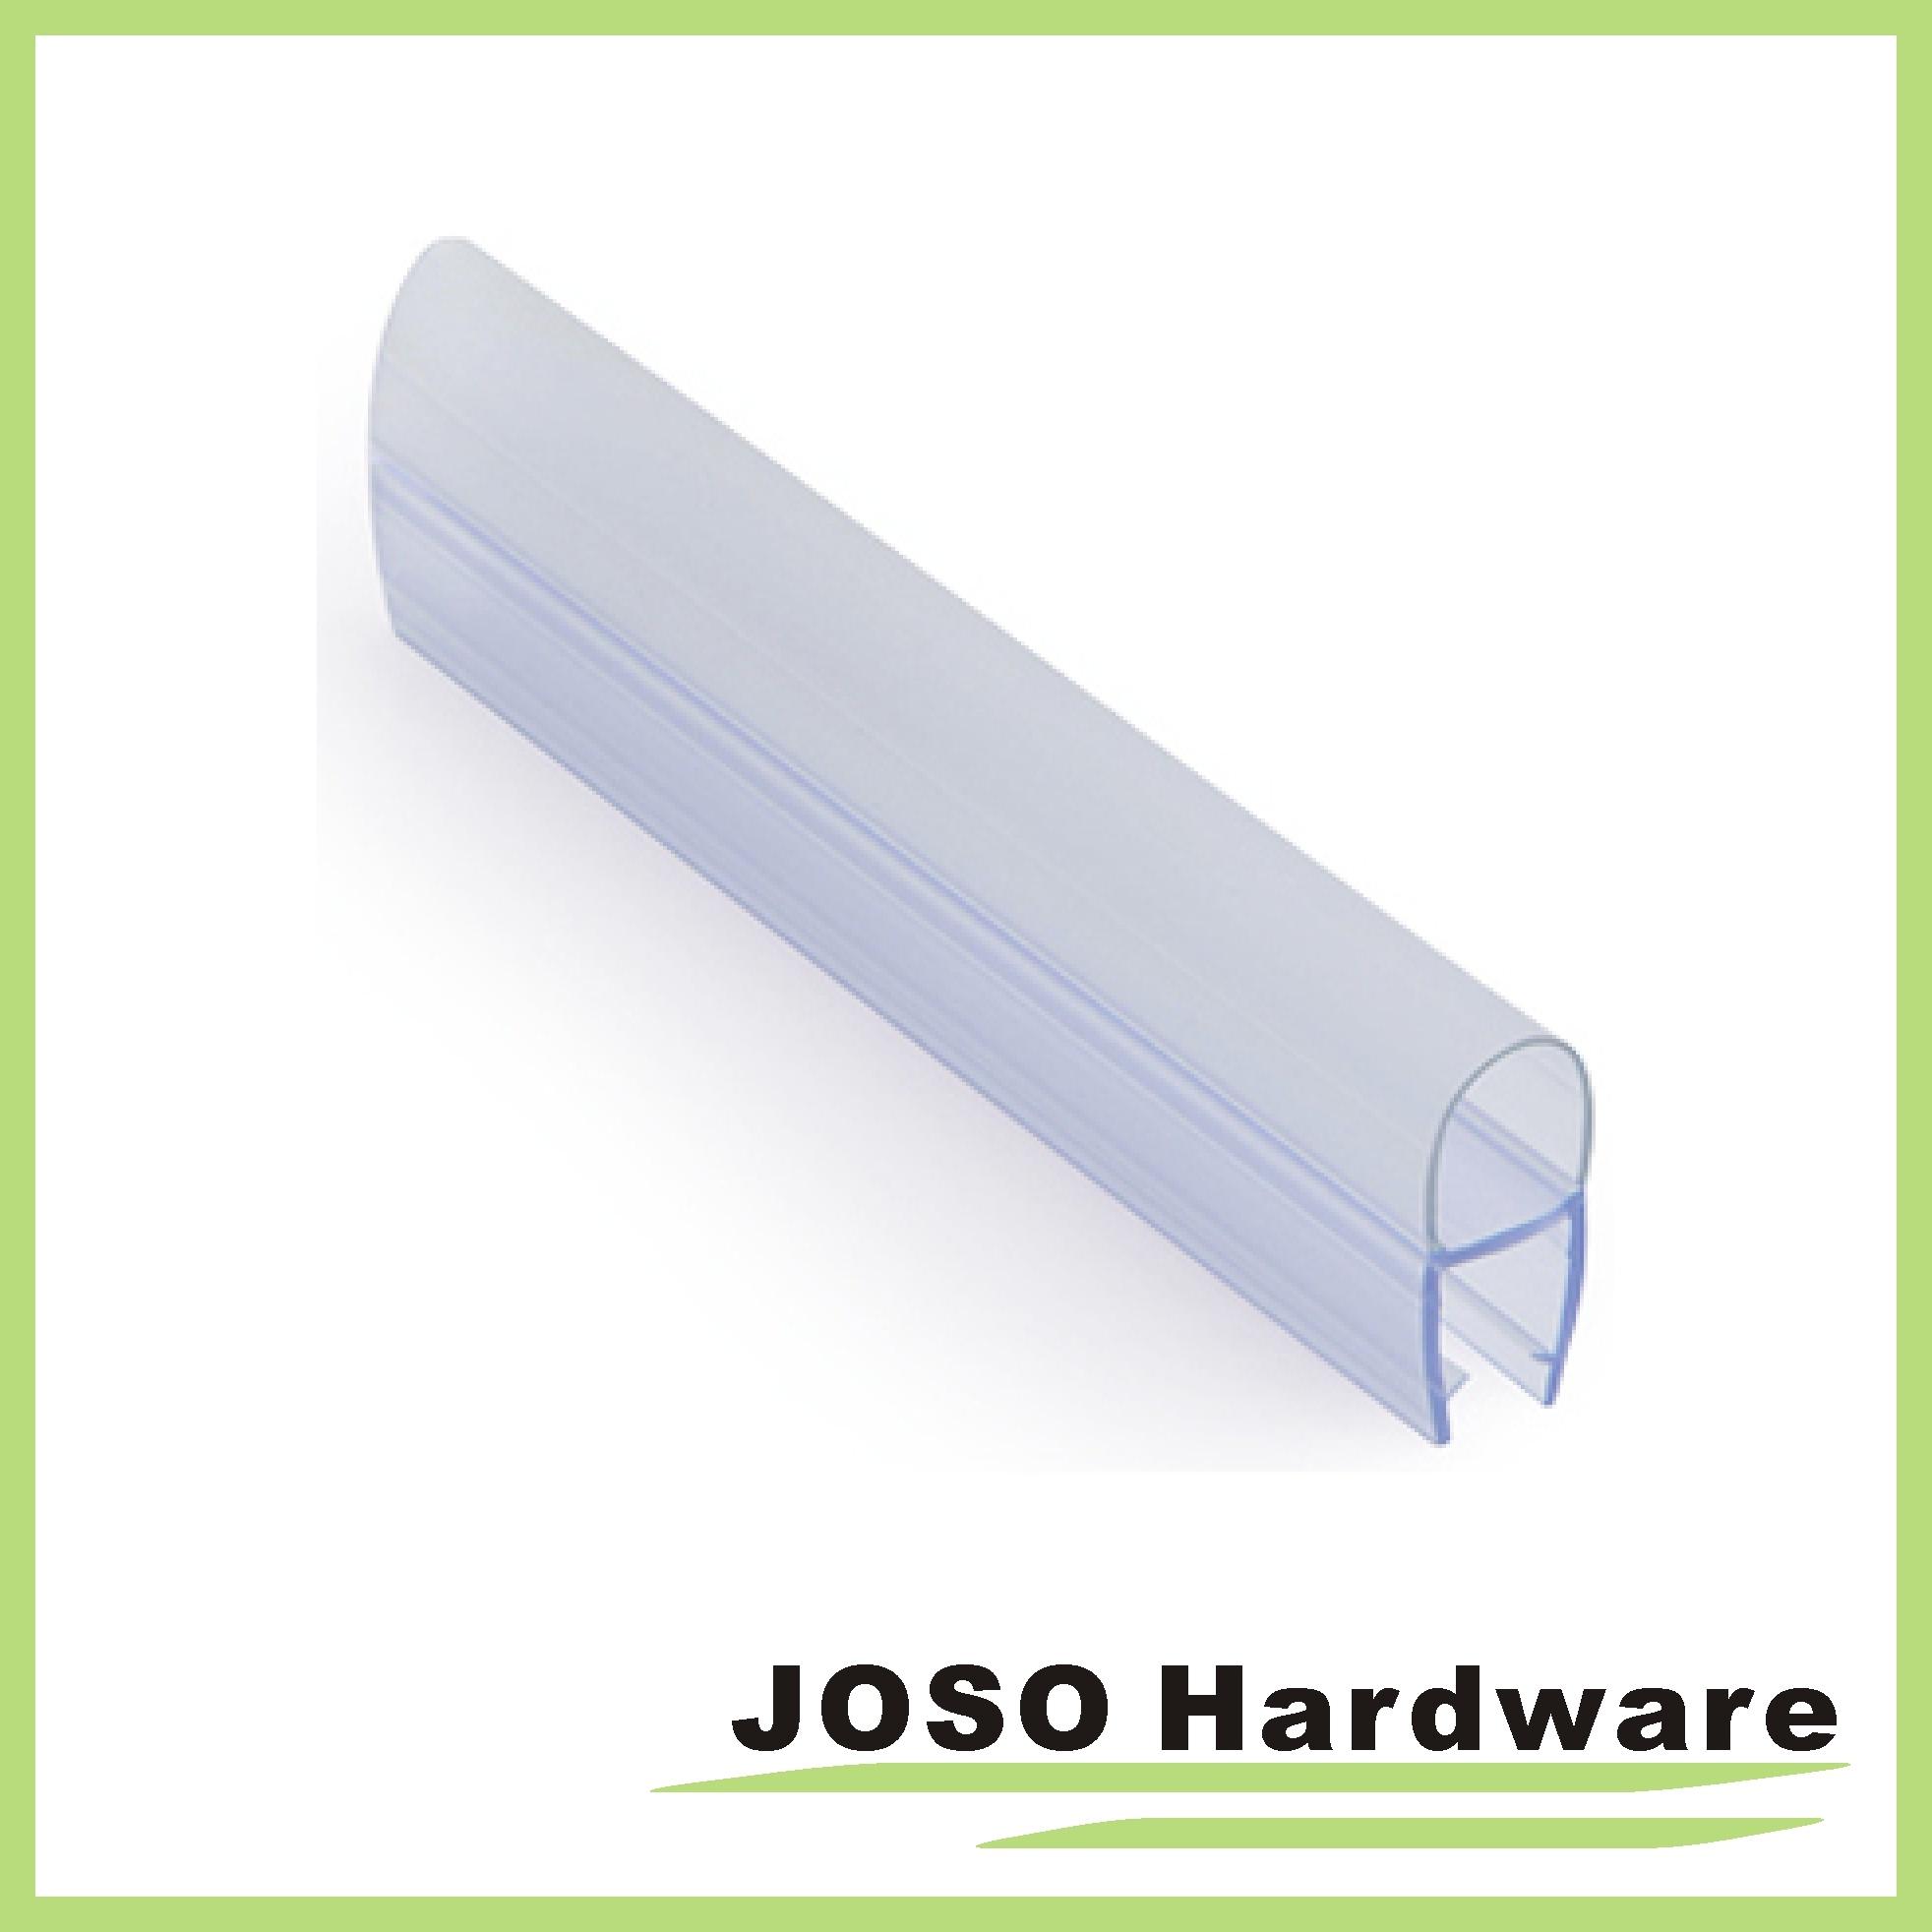 shower chrome clear seal finish hinged com pivot glass radius bathtub dp frameless mecor door amazon